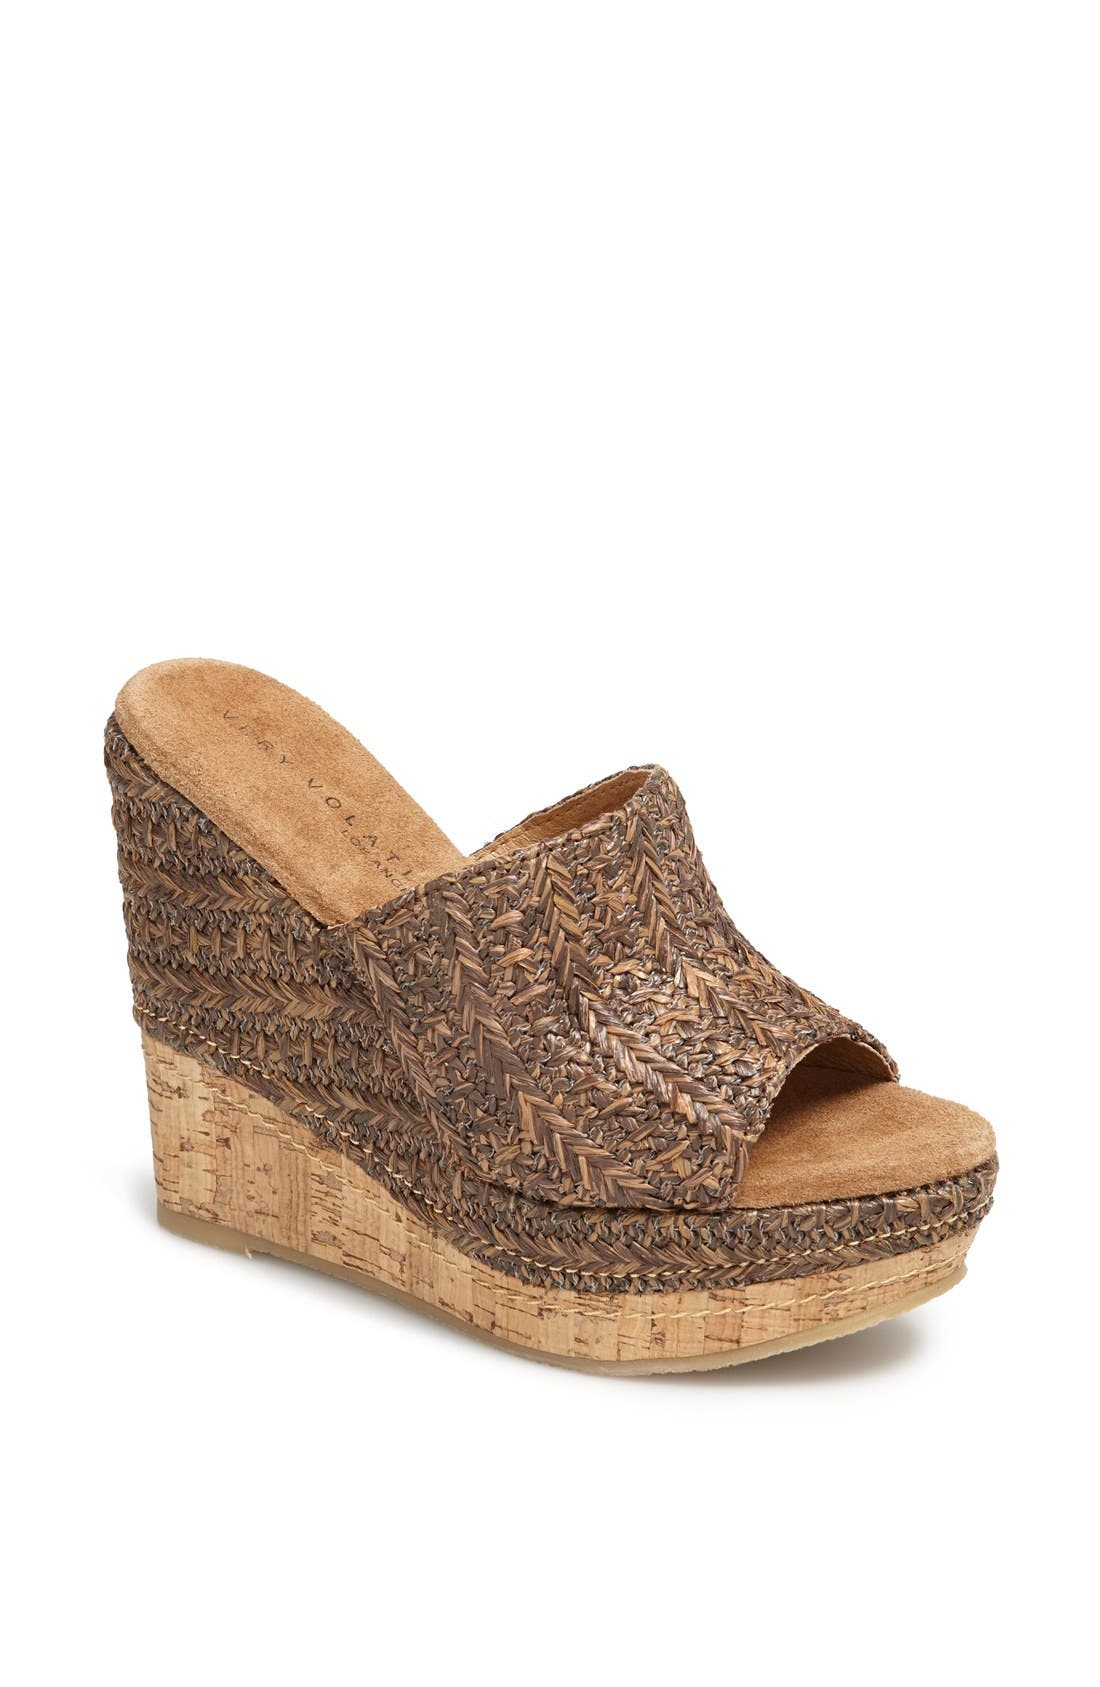 Alternate Image 1 Selected - Very Volatile 'Sandstone' Wedge Sandal